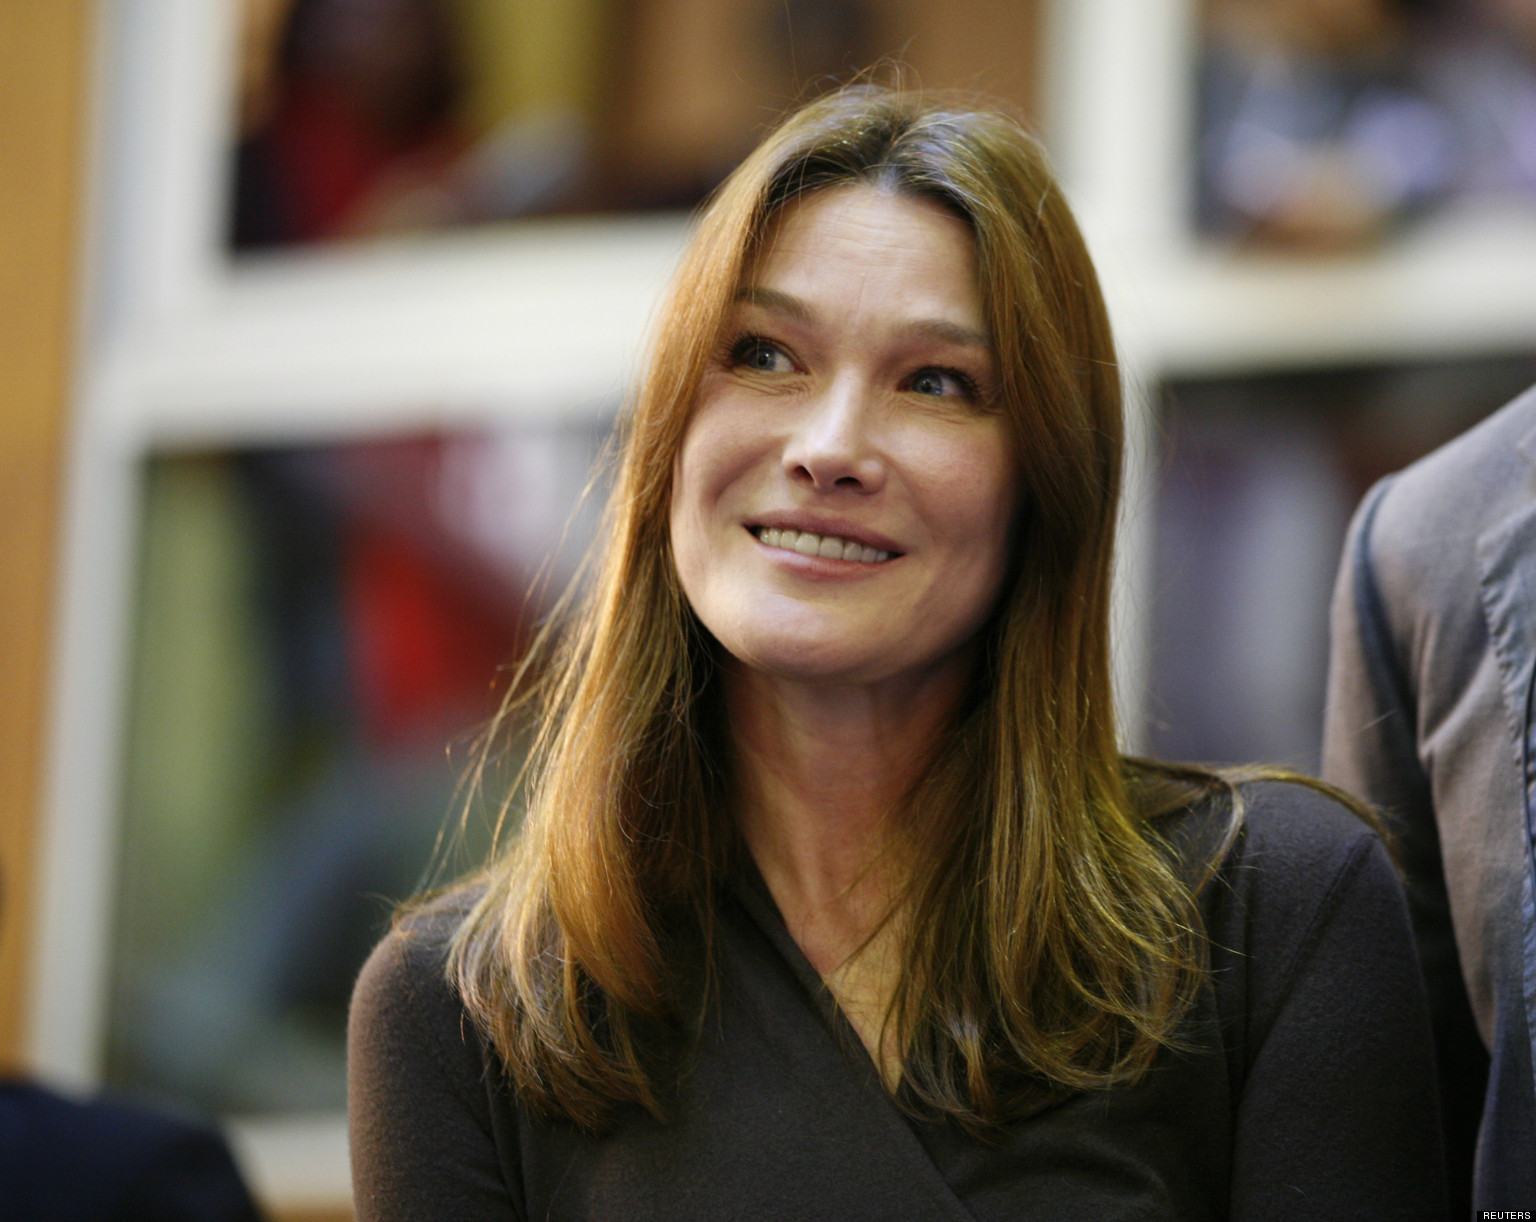 Carla bruni sarkozy a feminist by any other name mariya for Bruni arredamento